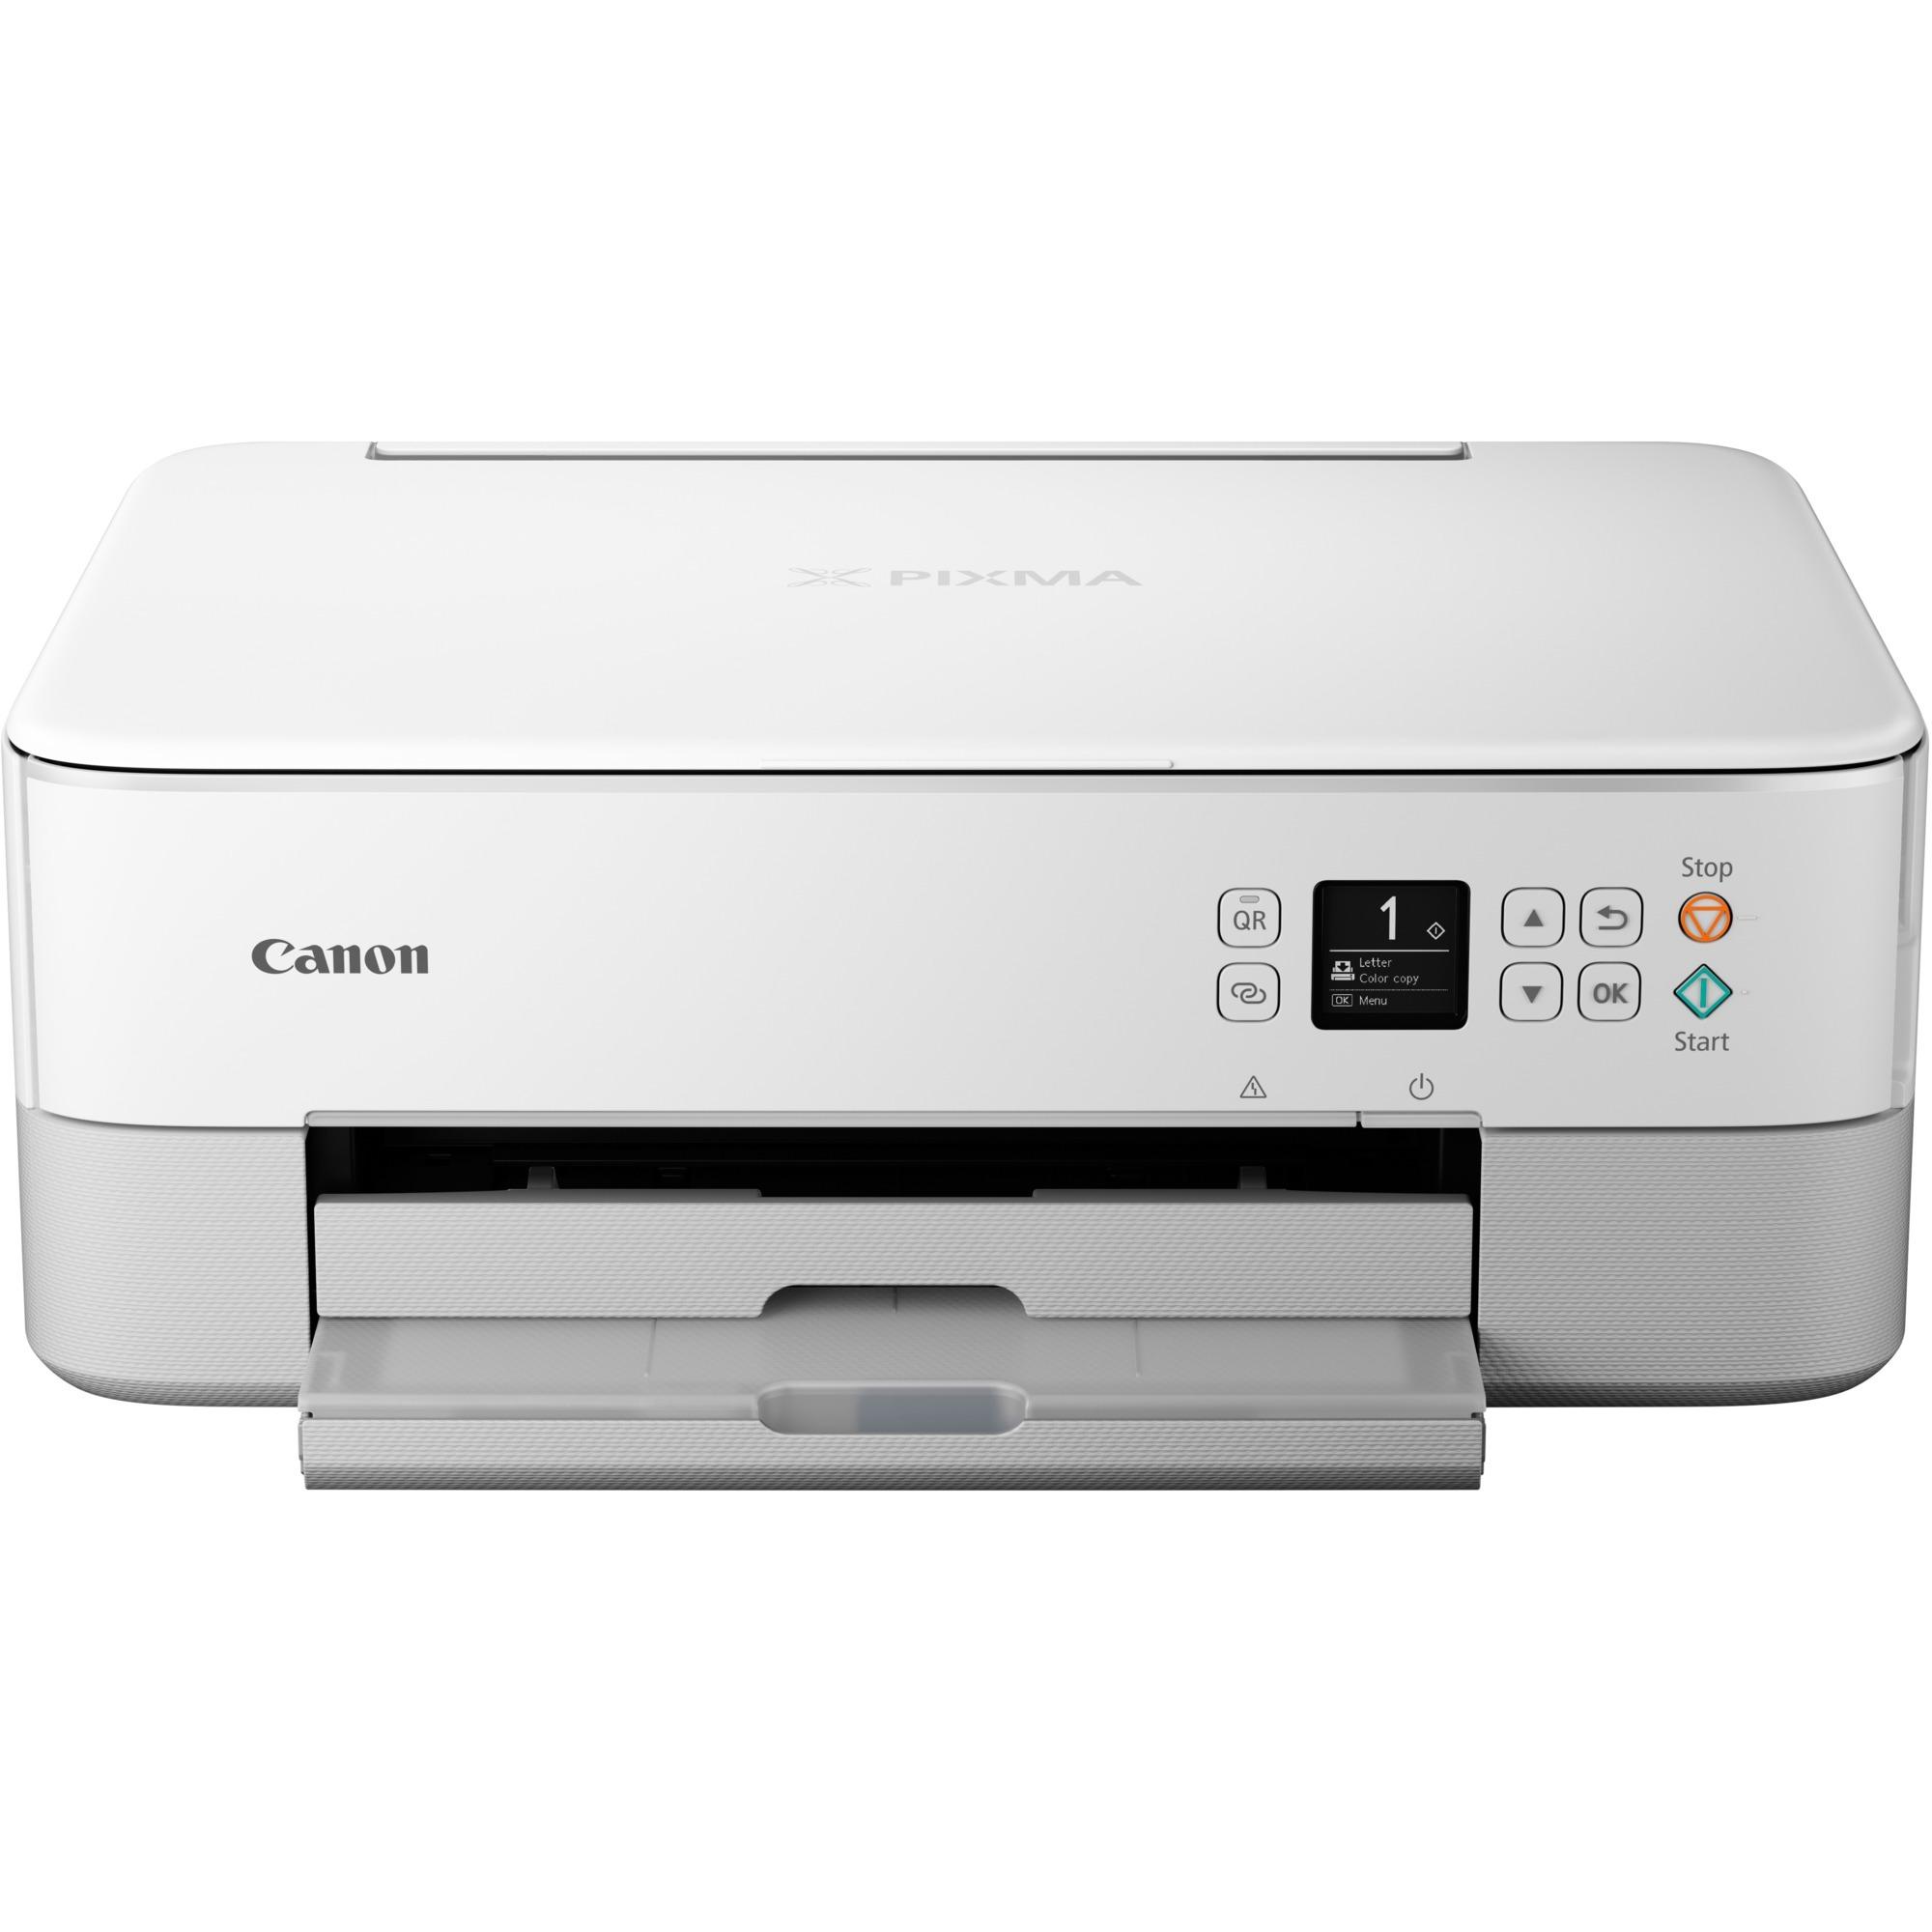 3773C026AA, Impresora multifuncional